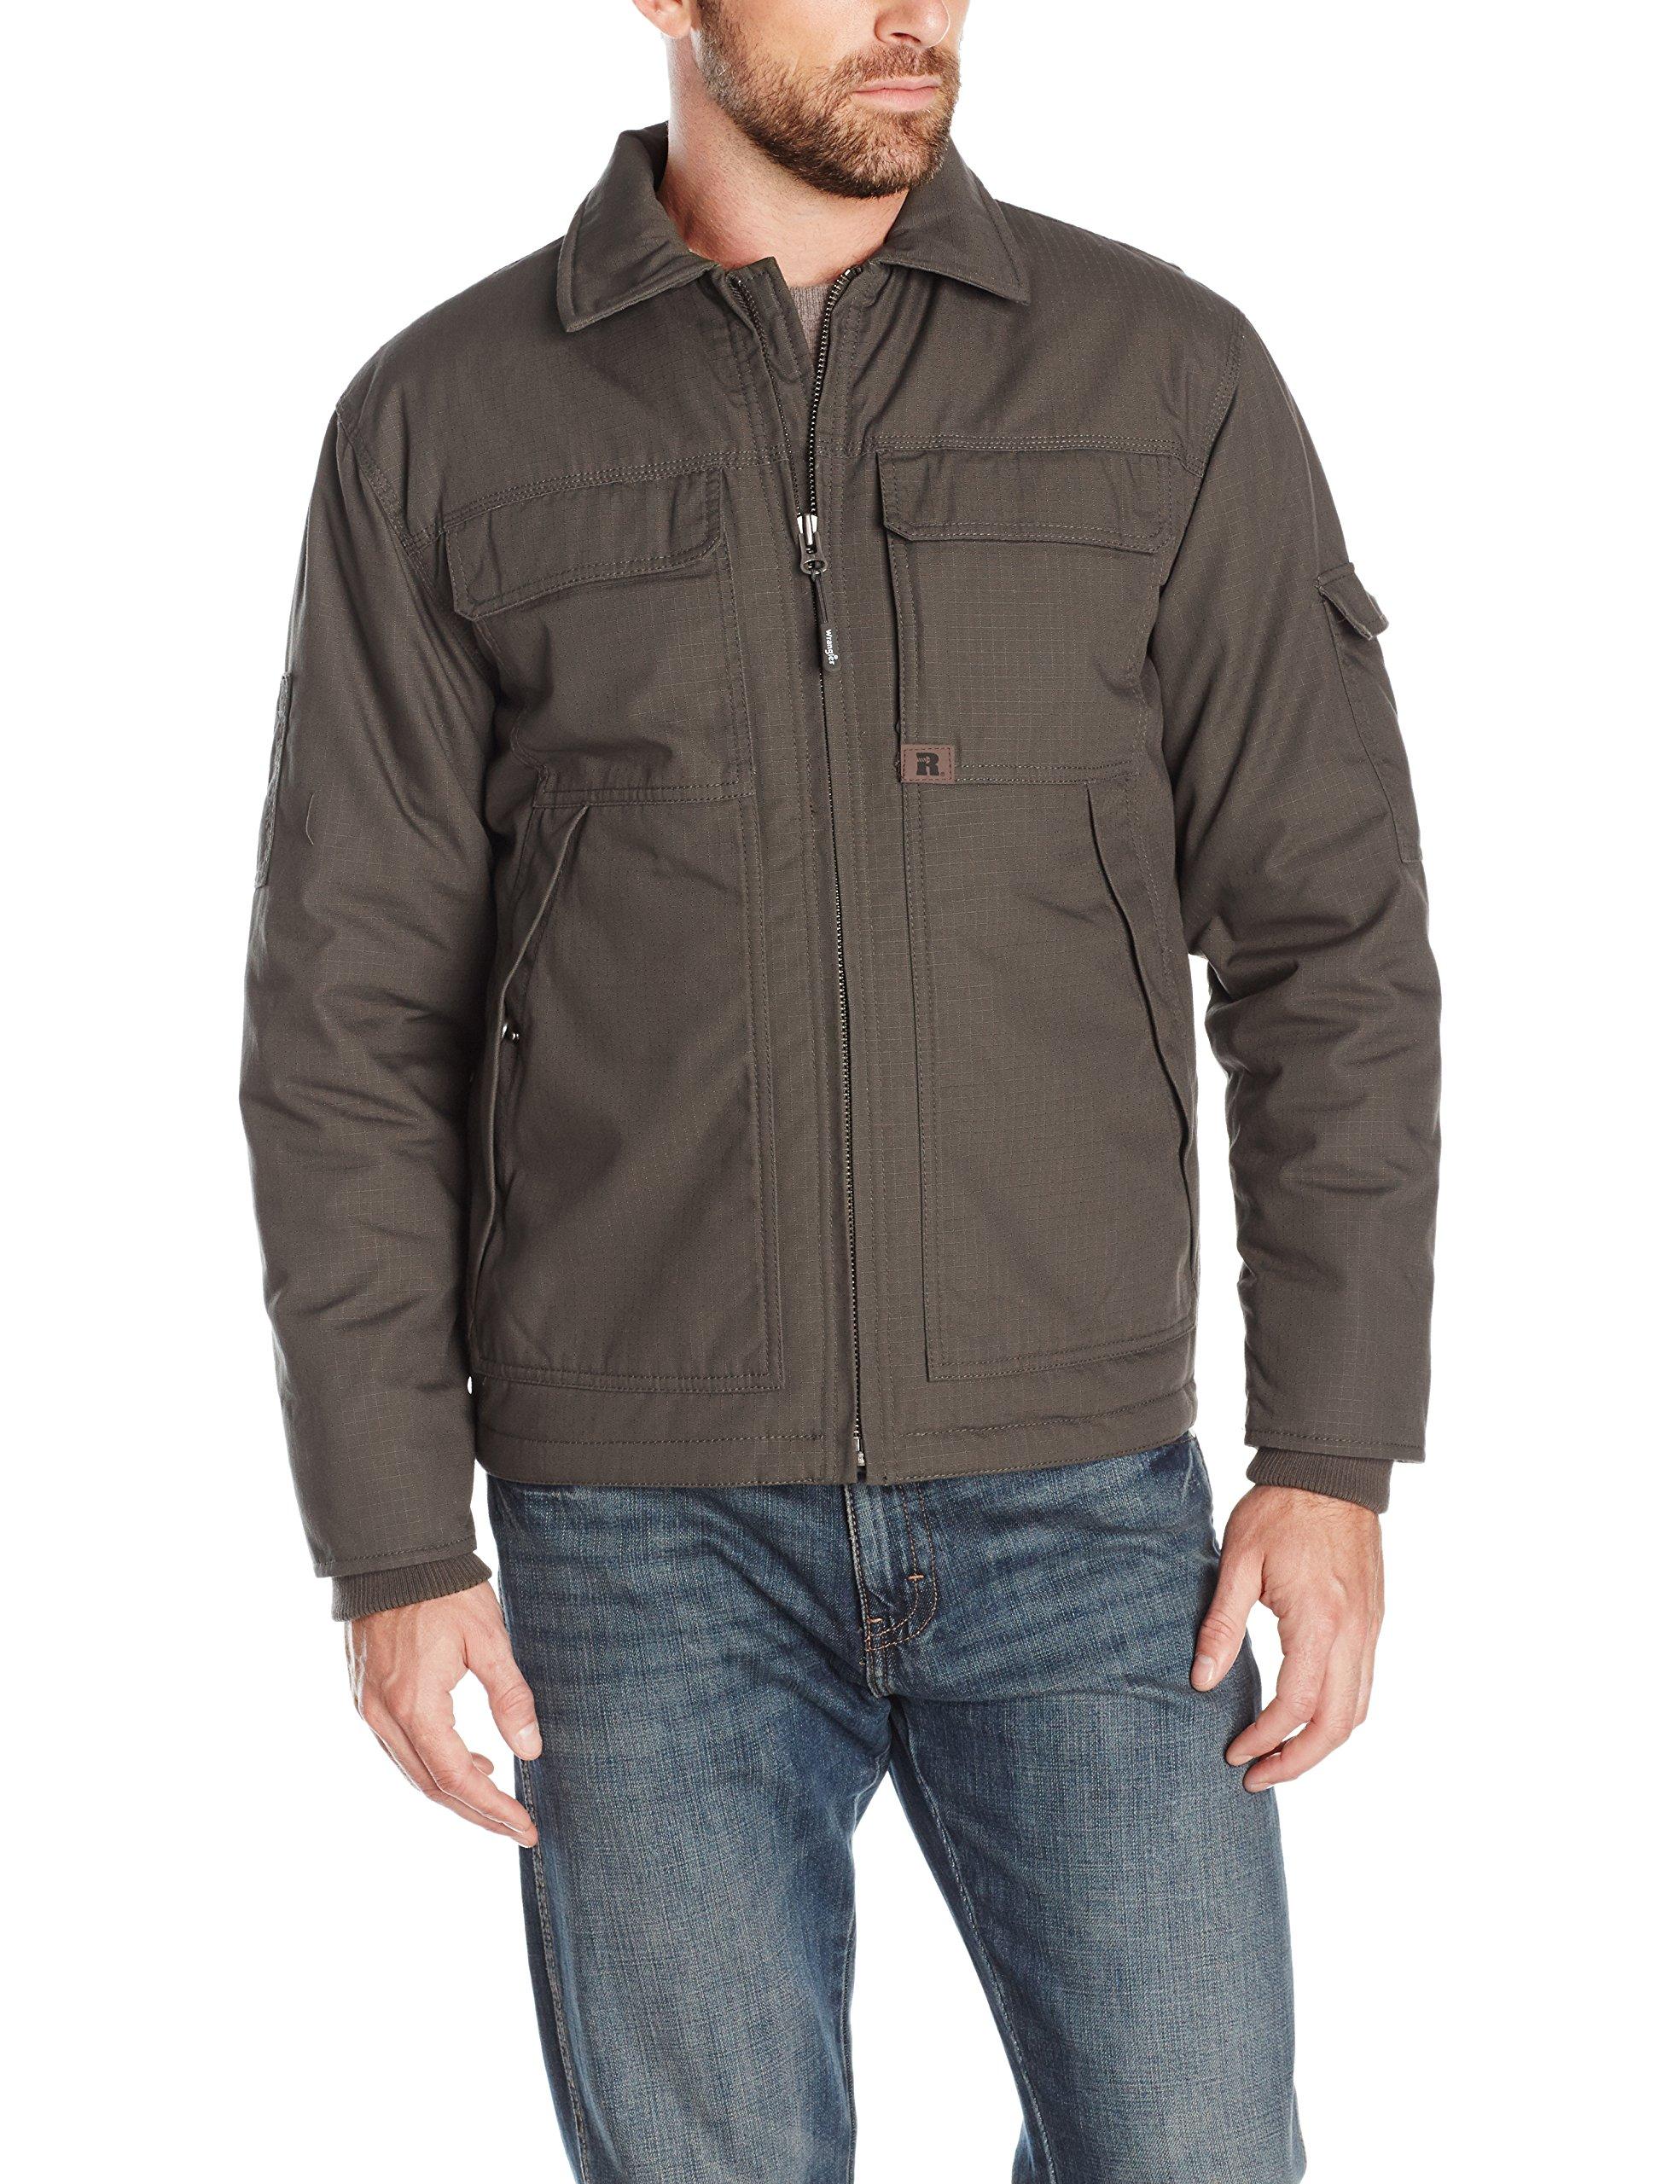 Wrangler RIGGS WORKWEAR Men's Ranger Jacket, Loden, Large